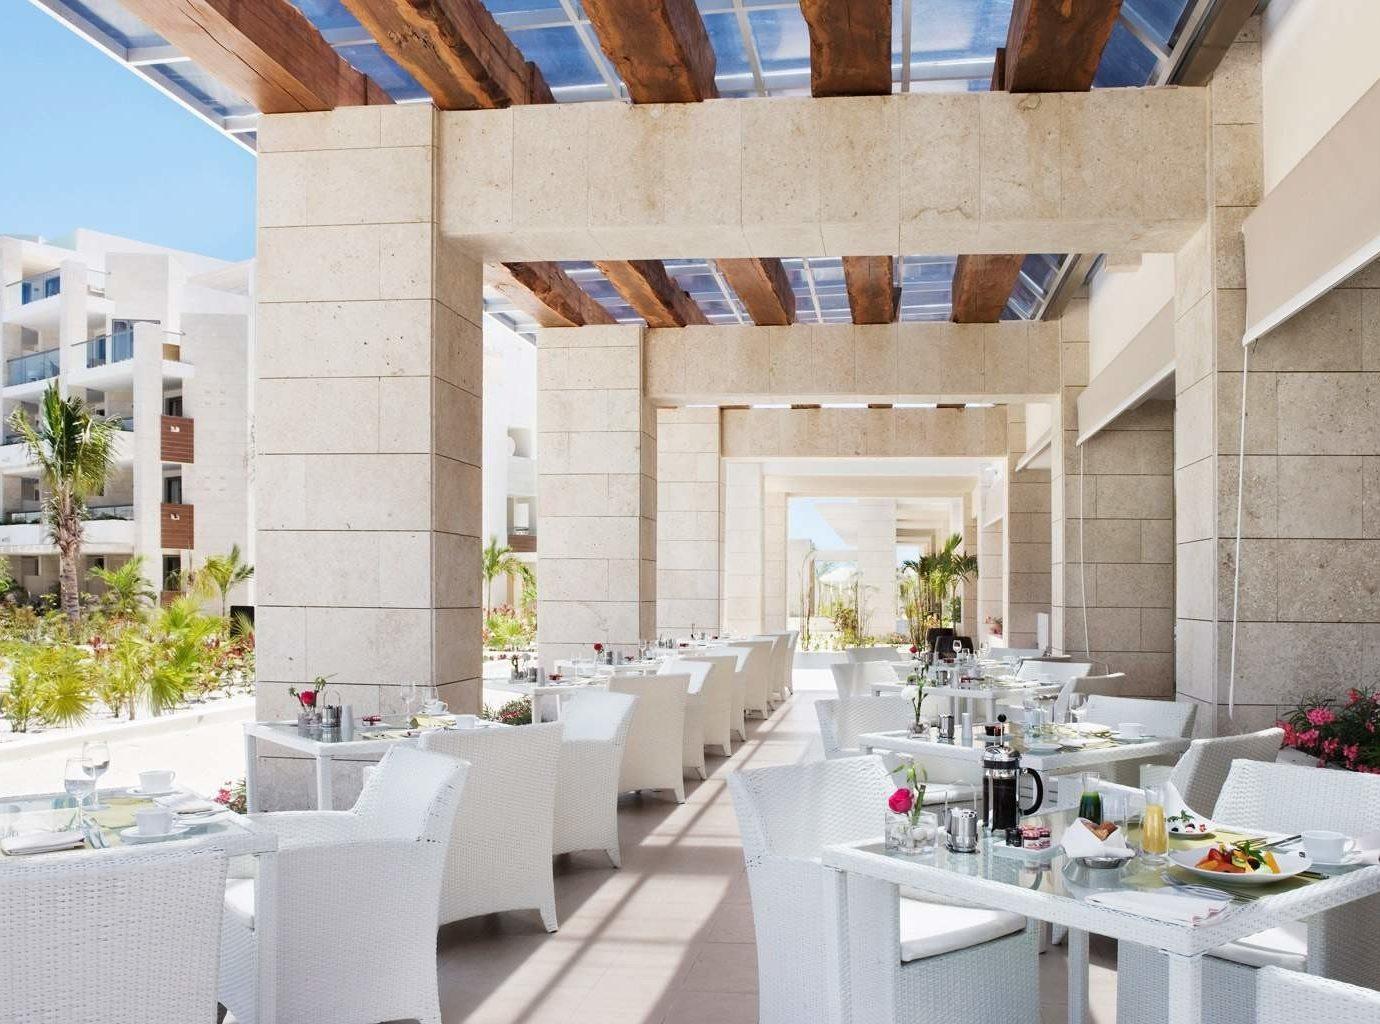 Hotels Romance counter indoor property room interior design real estate home estate Design restaurant professional meal apartment condominium Villa Bar Island